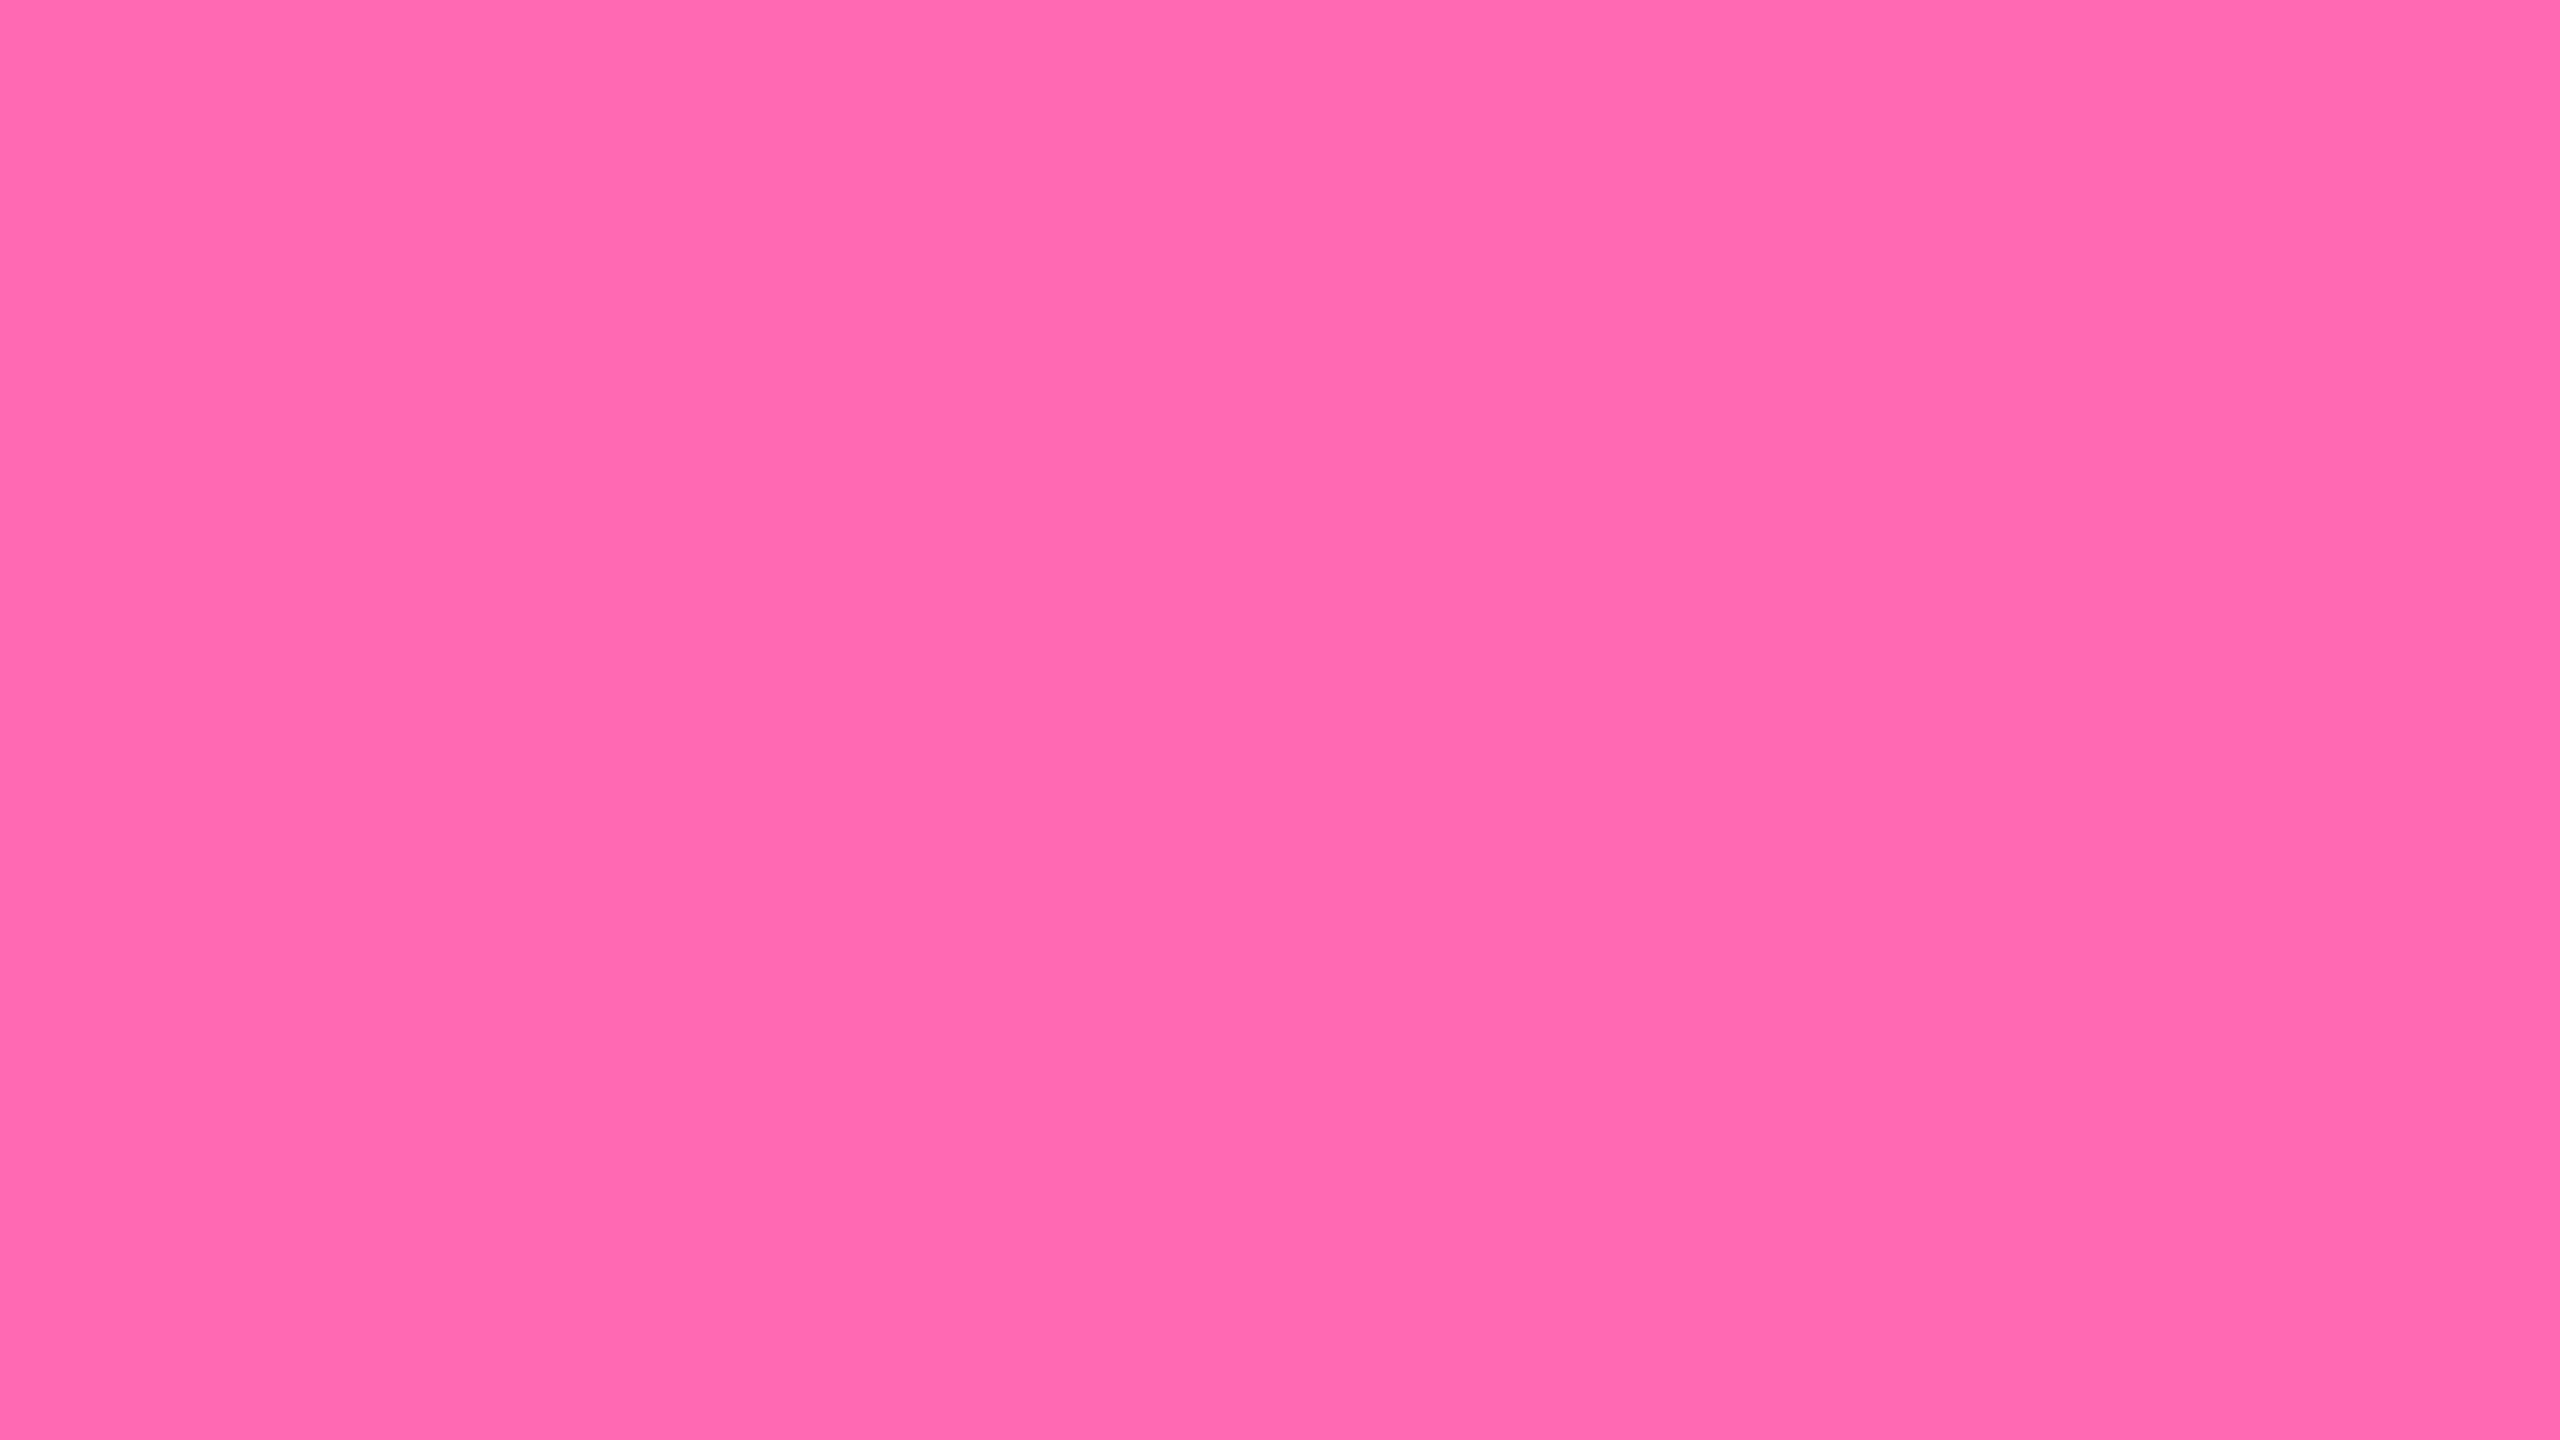 Bright Pink Background ·①